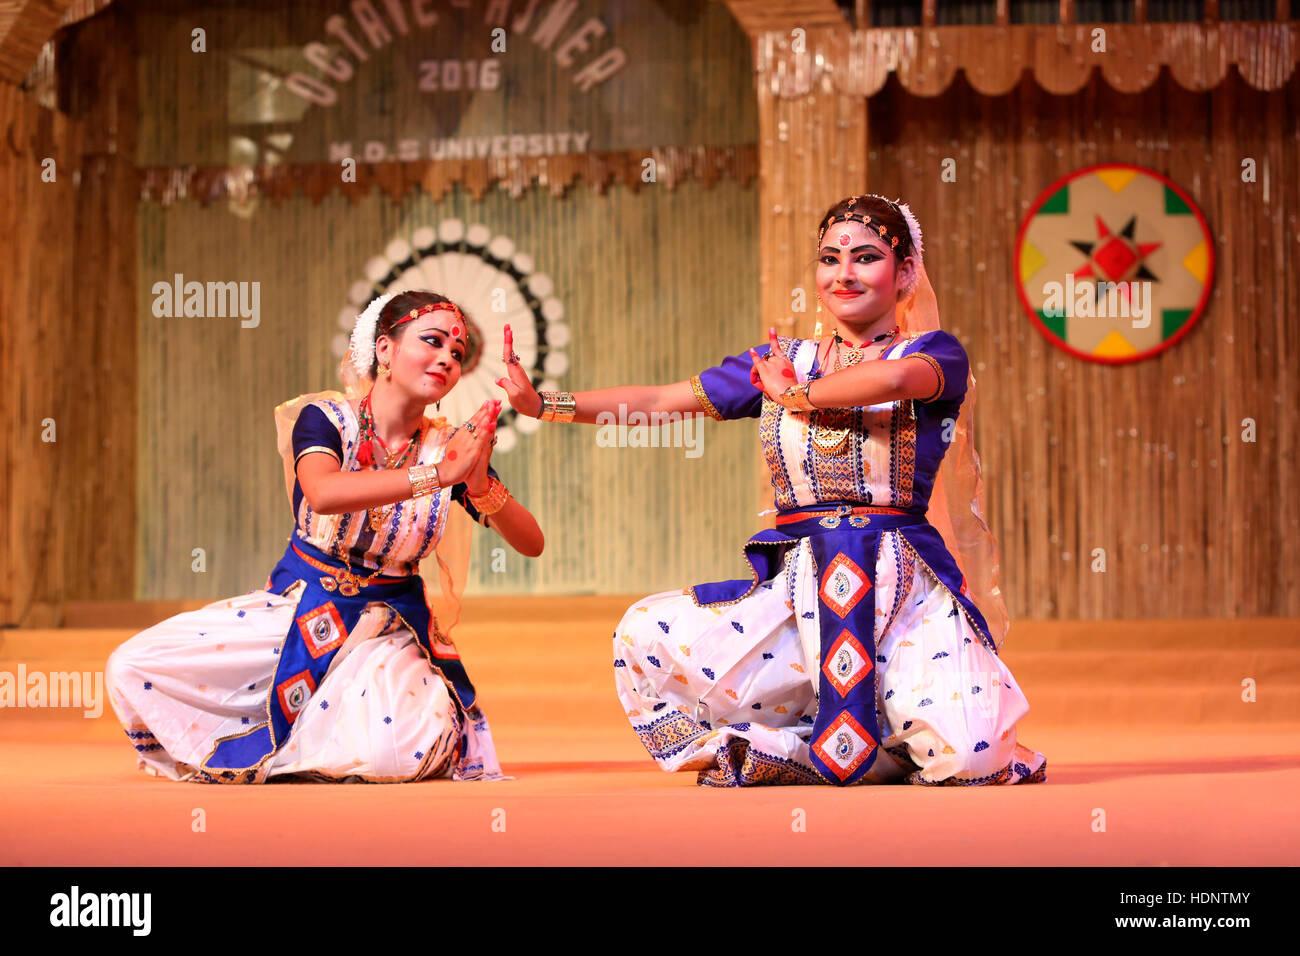 Bailarines tradicionales de Assam realizar Sattriya danza. Festival tribal en Ajmer, Rajasthan, India Foto de stock